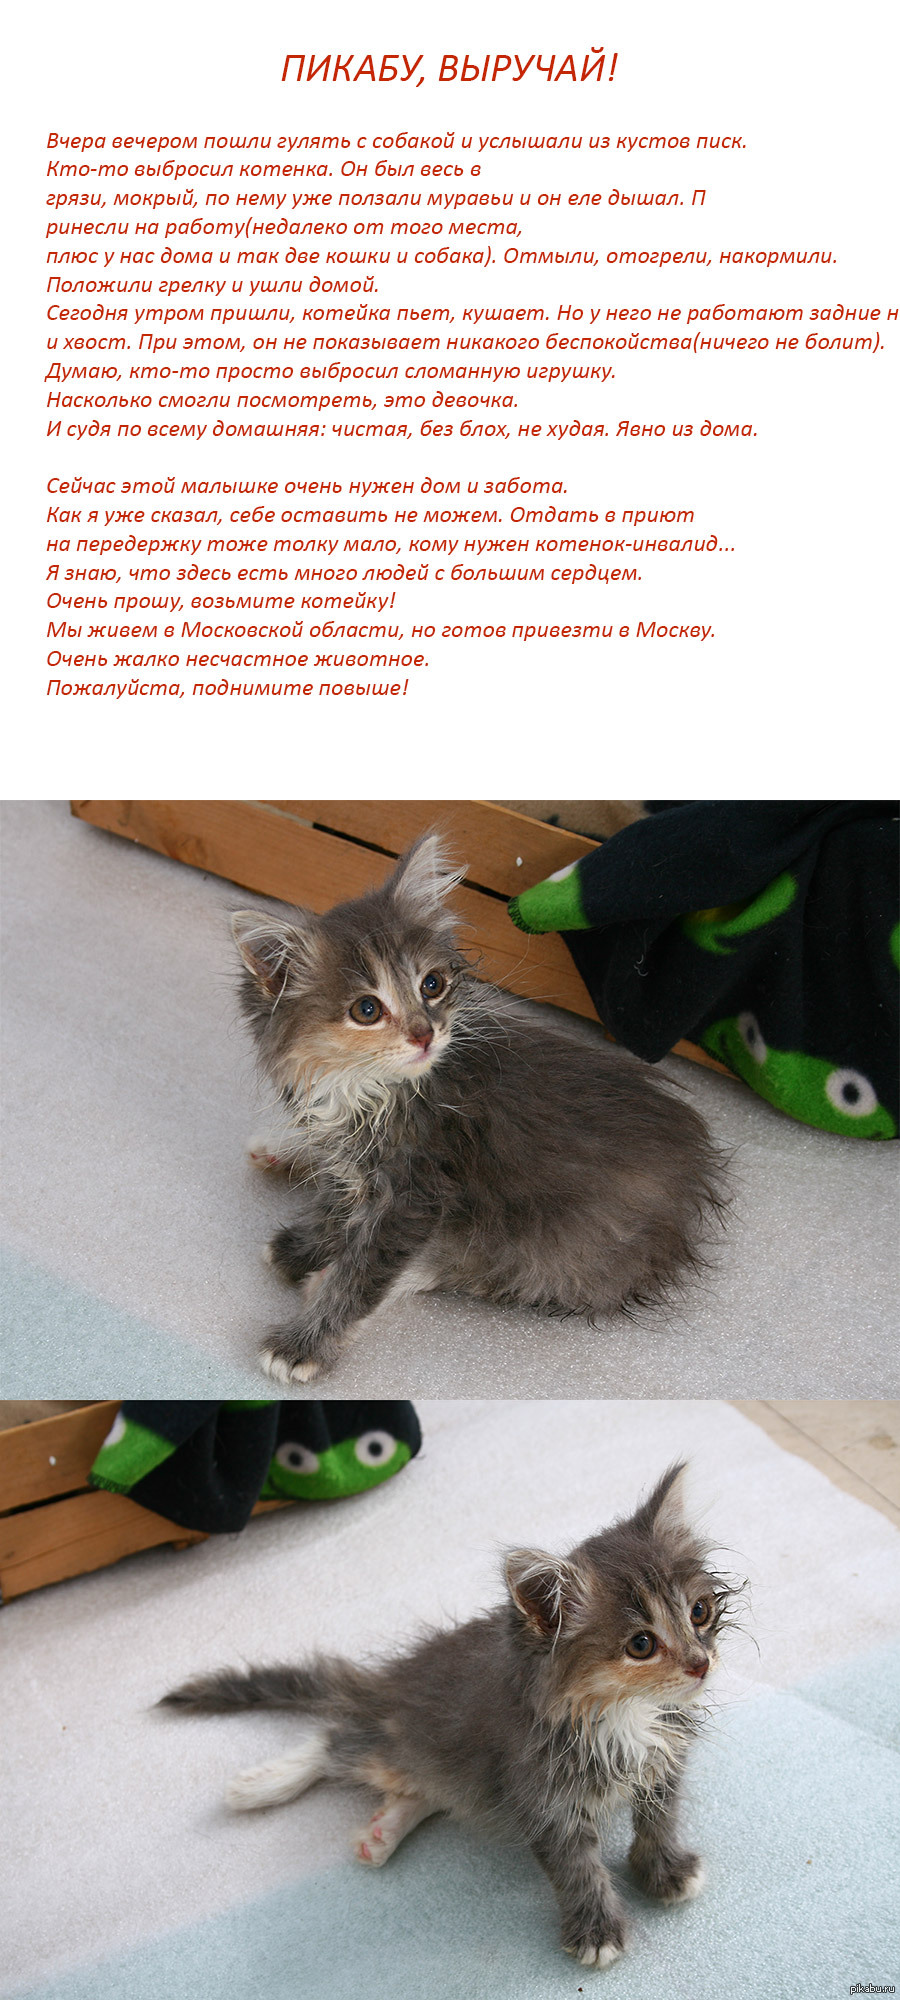 Картинки нужна помощь котенку при